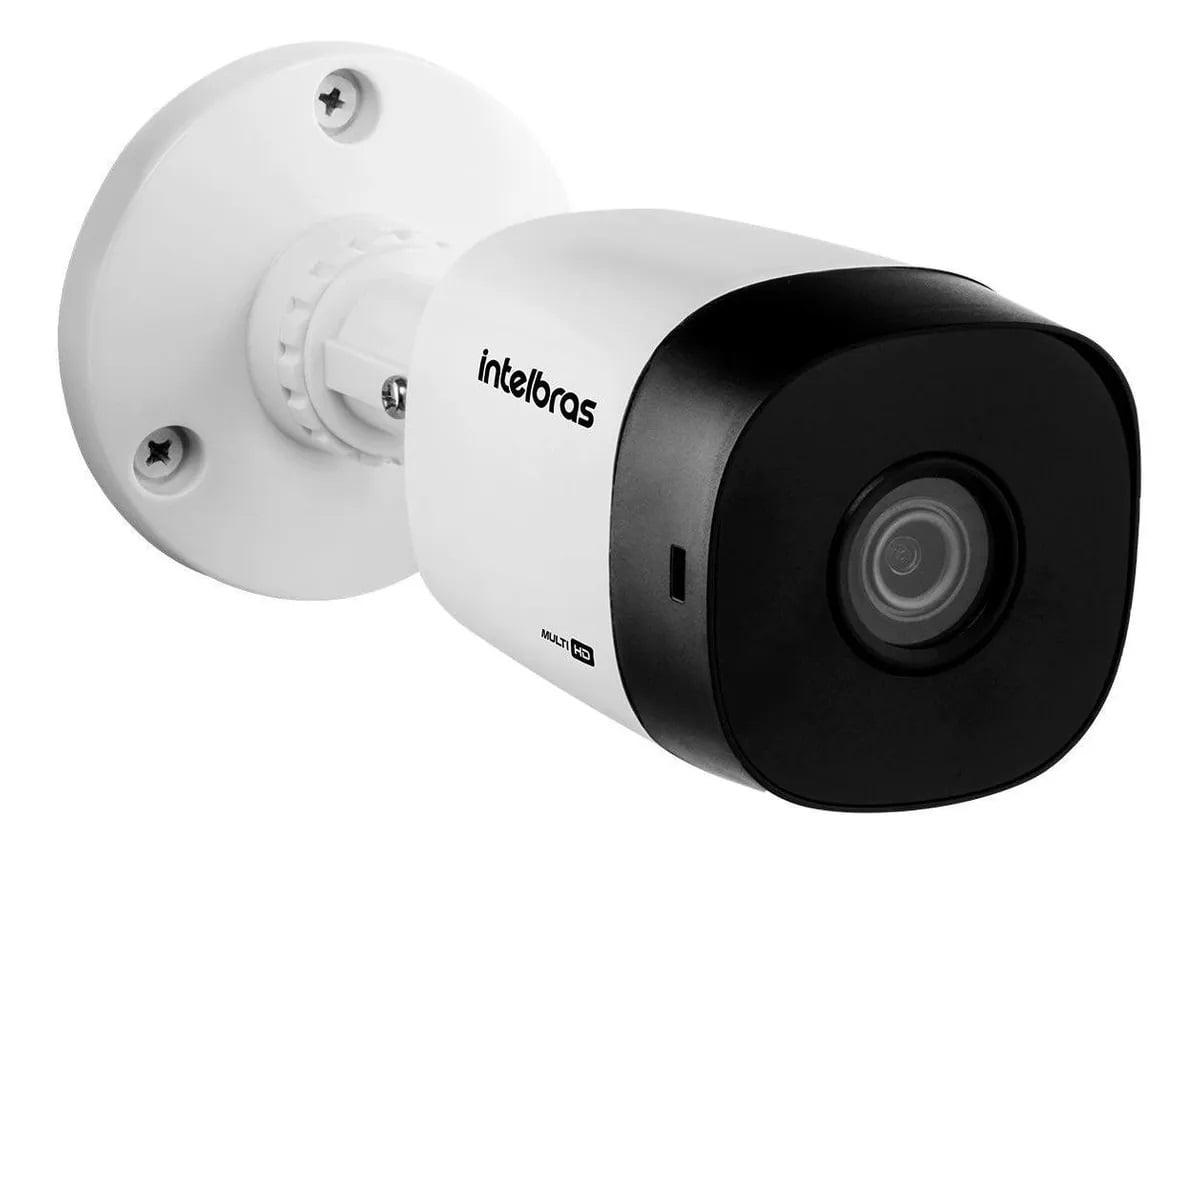 Camera Intelbras Infra Hdcvi 720p 2,6 Mm Hd Vhd 3120b Cftv - Original com nota fiscal